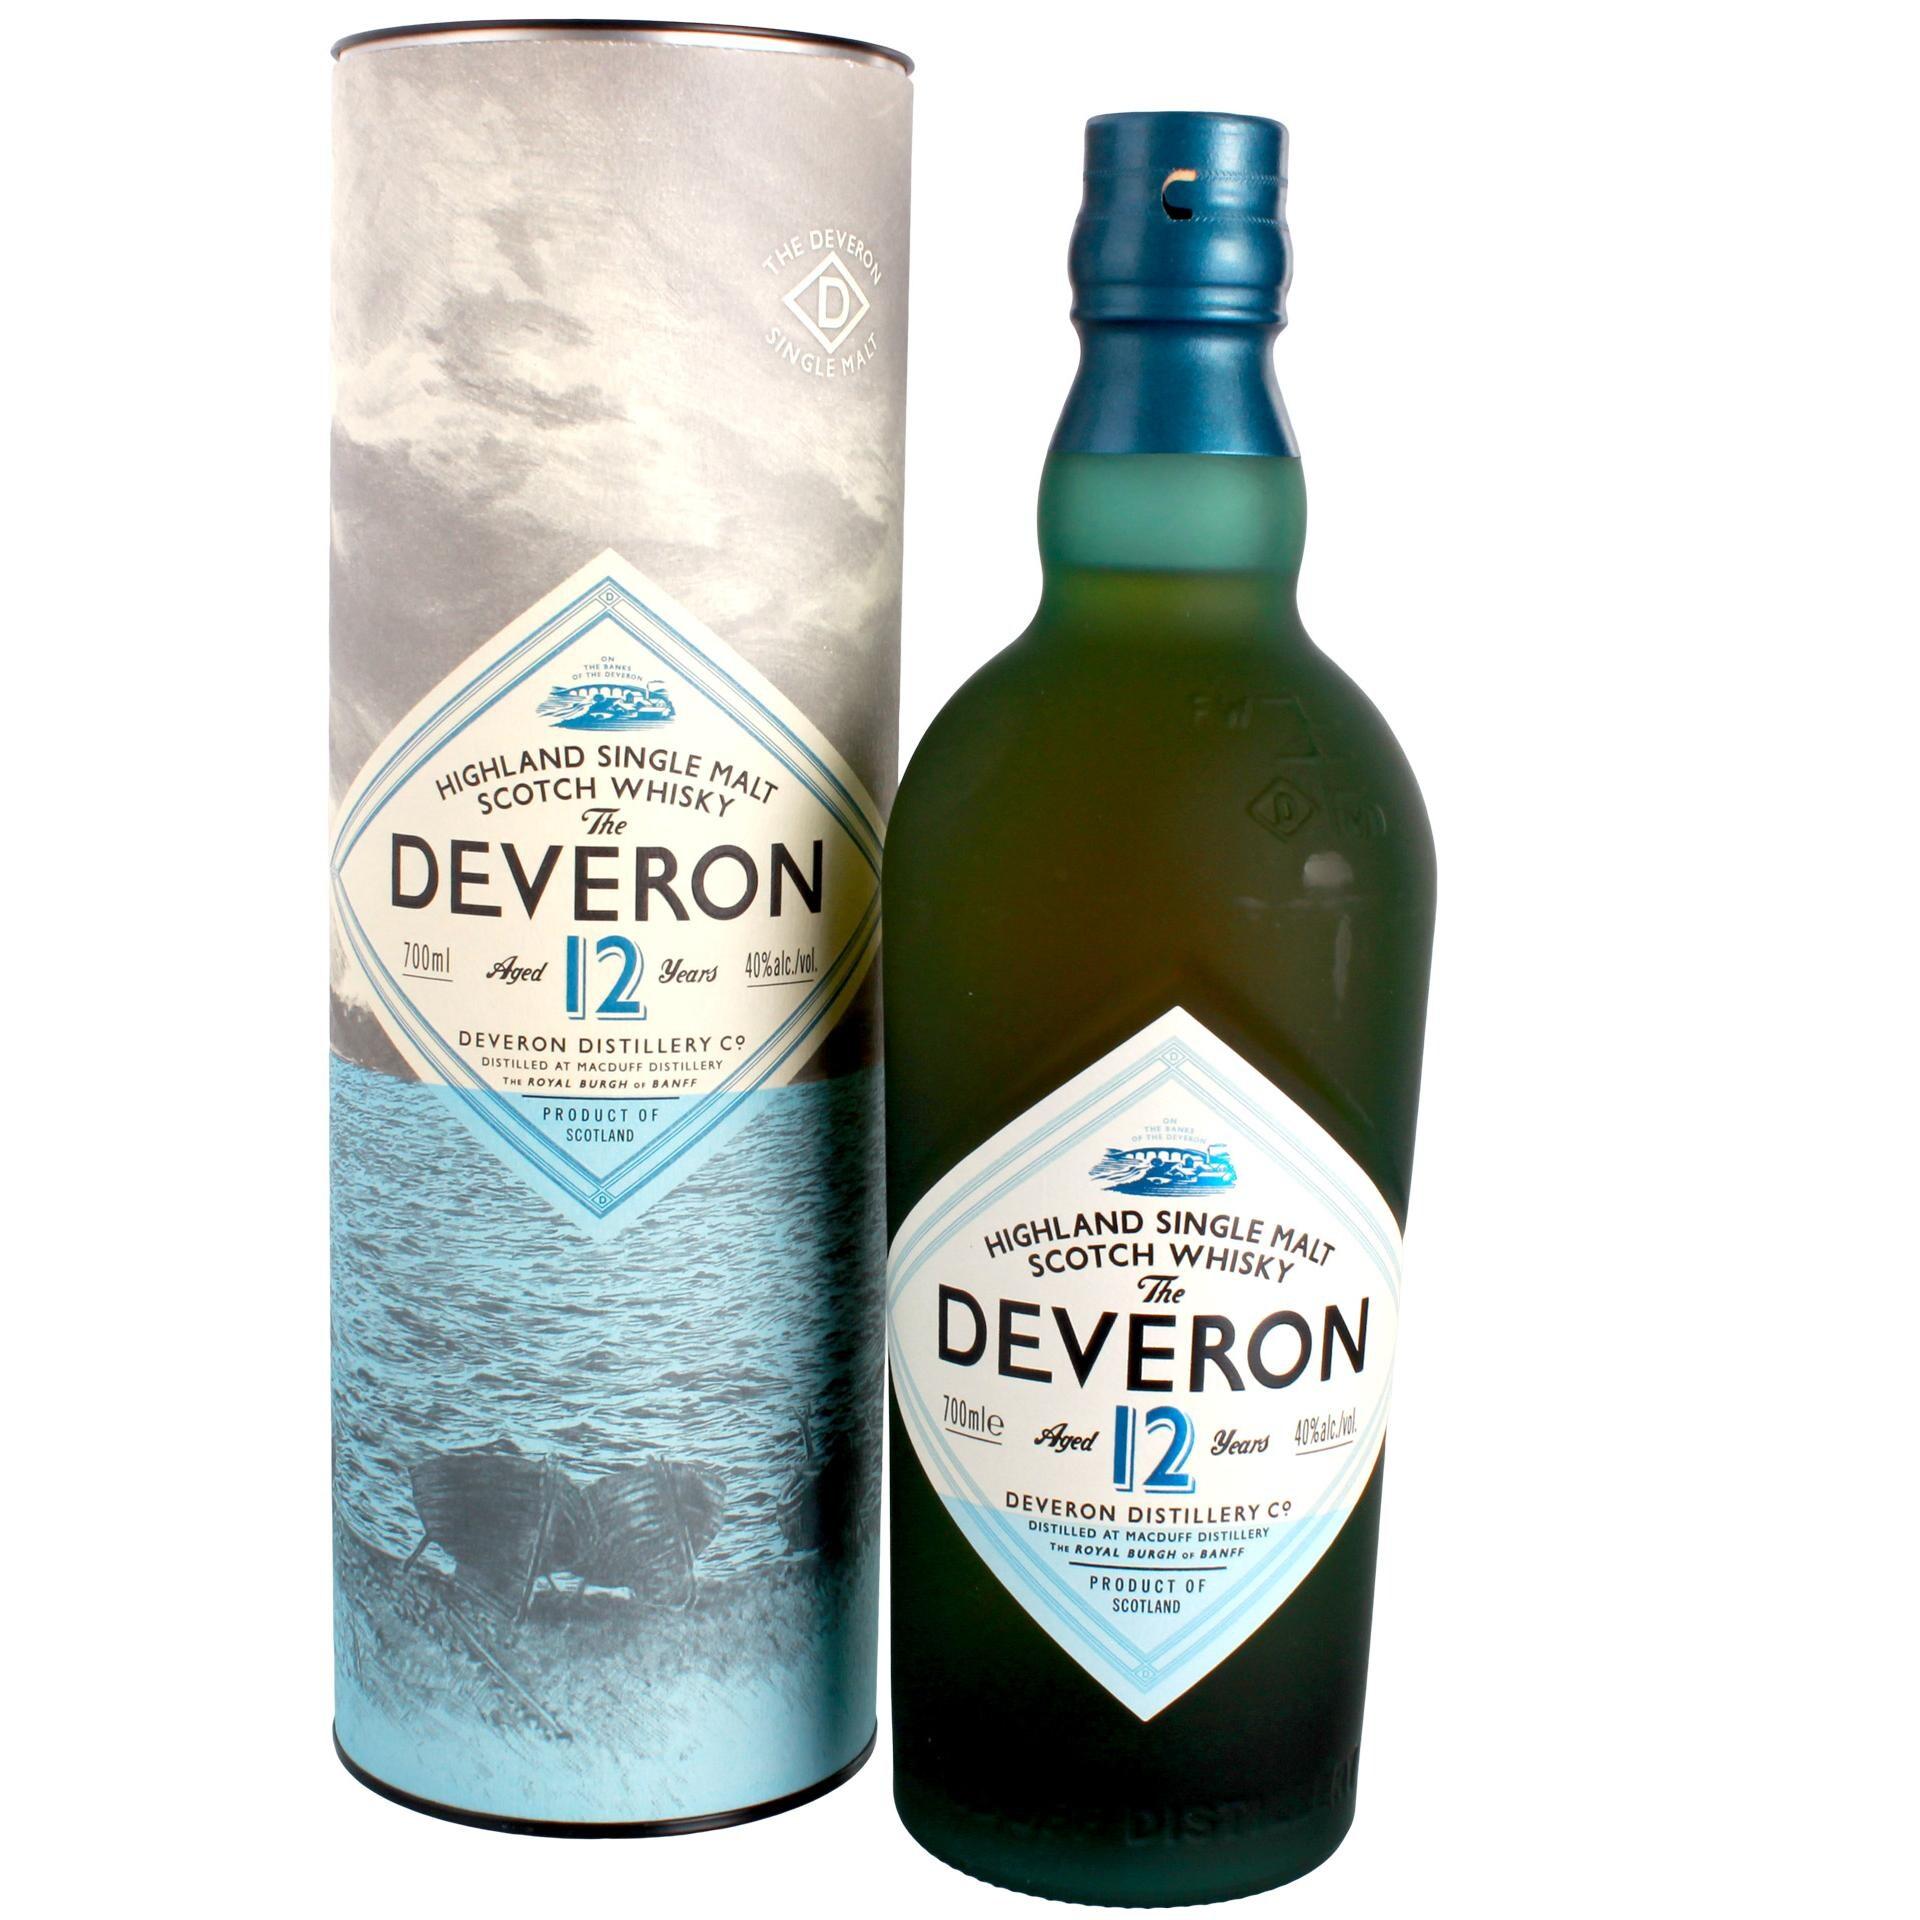 The Deveron Highland Single Malt Scotch Whisky Whiskey 0,7l